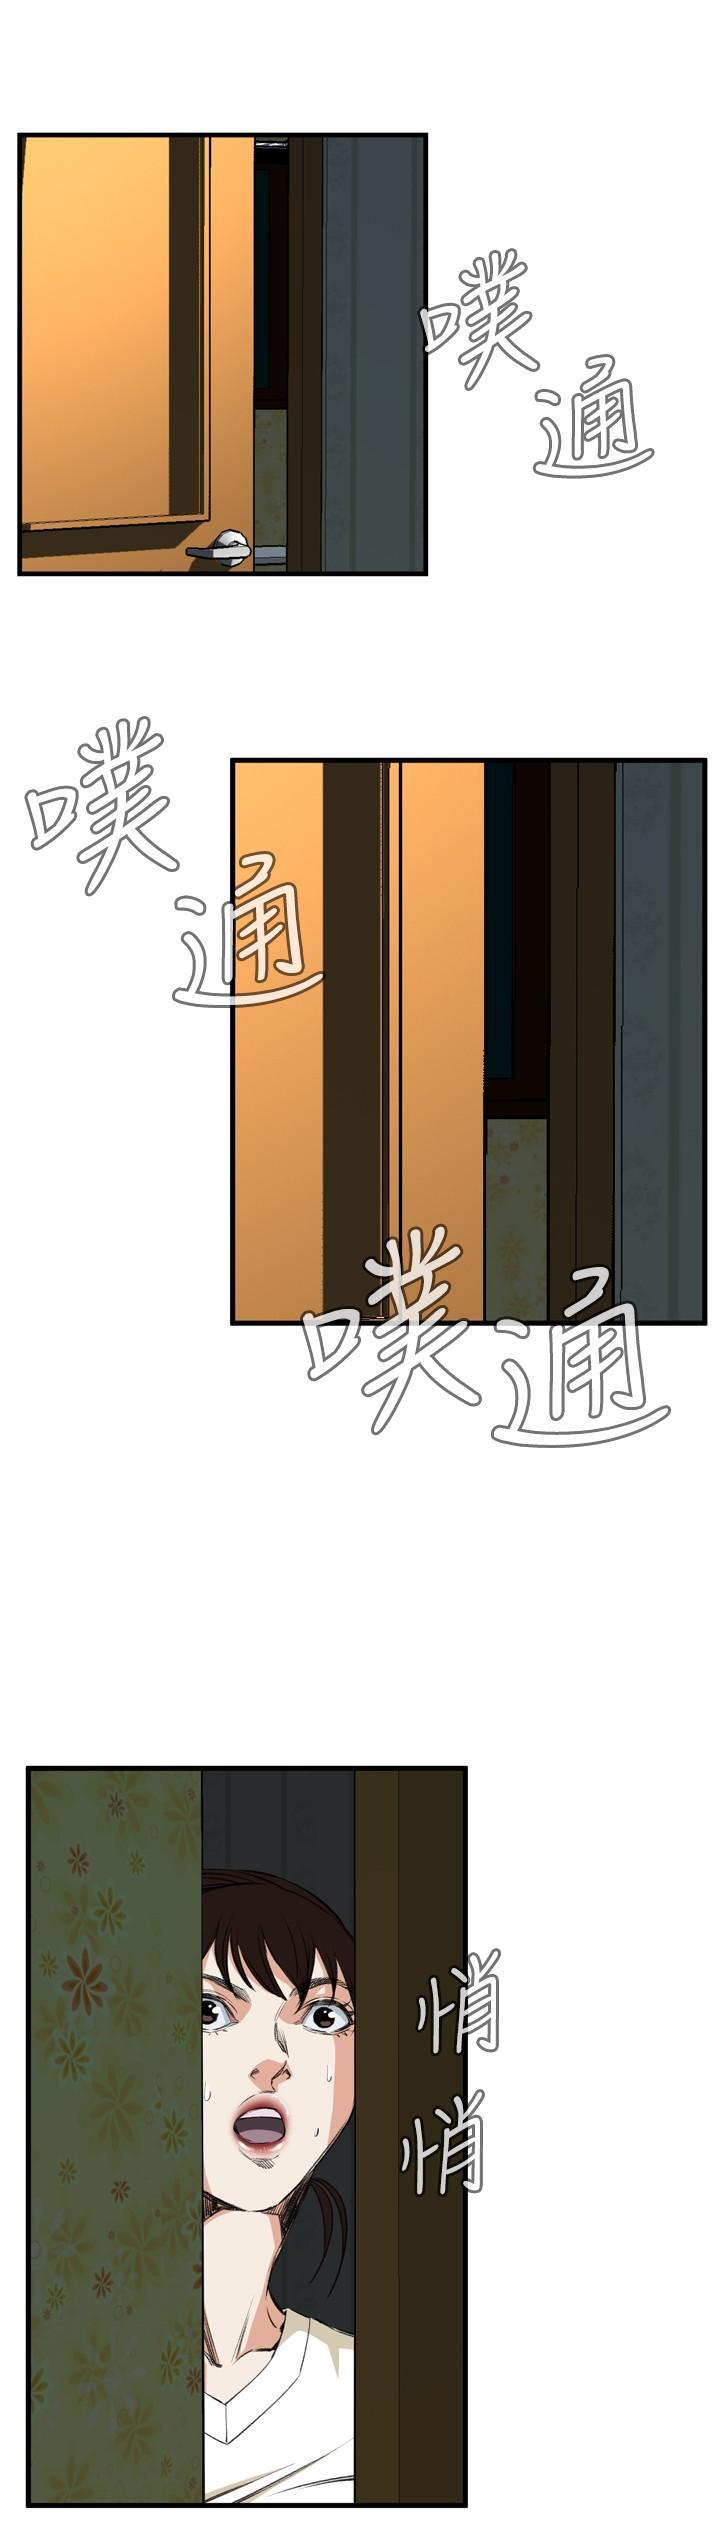 Take a Peek 偷窥 Ch.39~55 [Chinese]中文 159